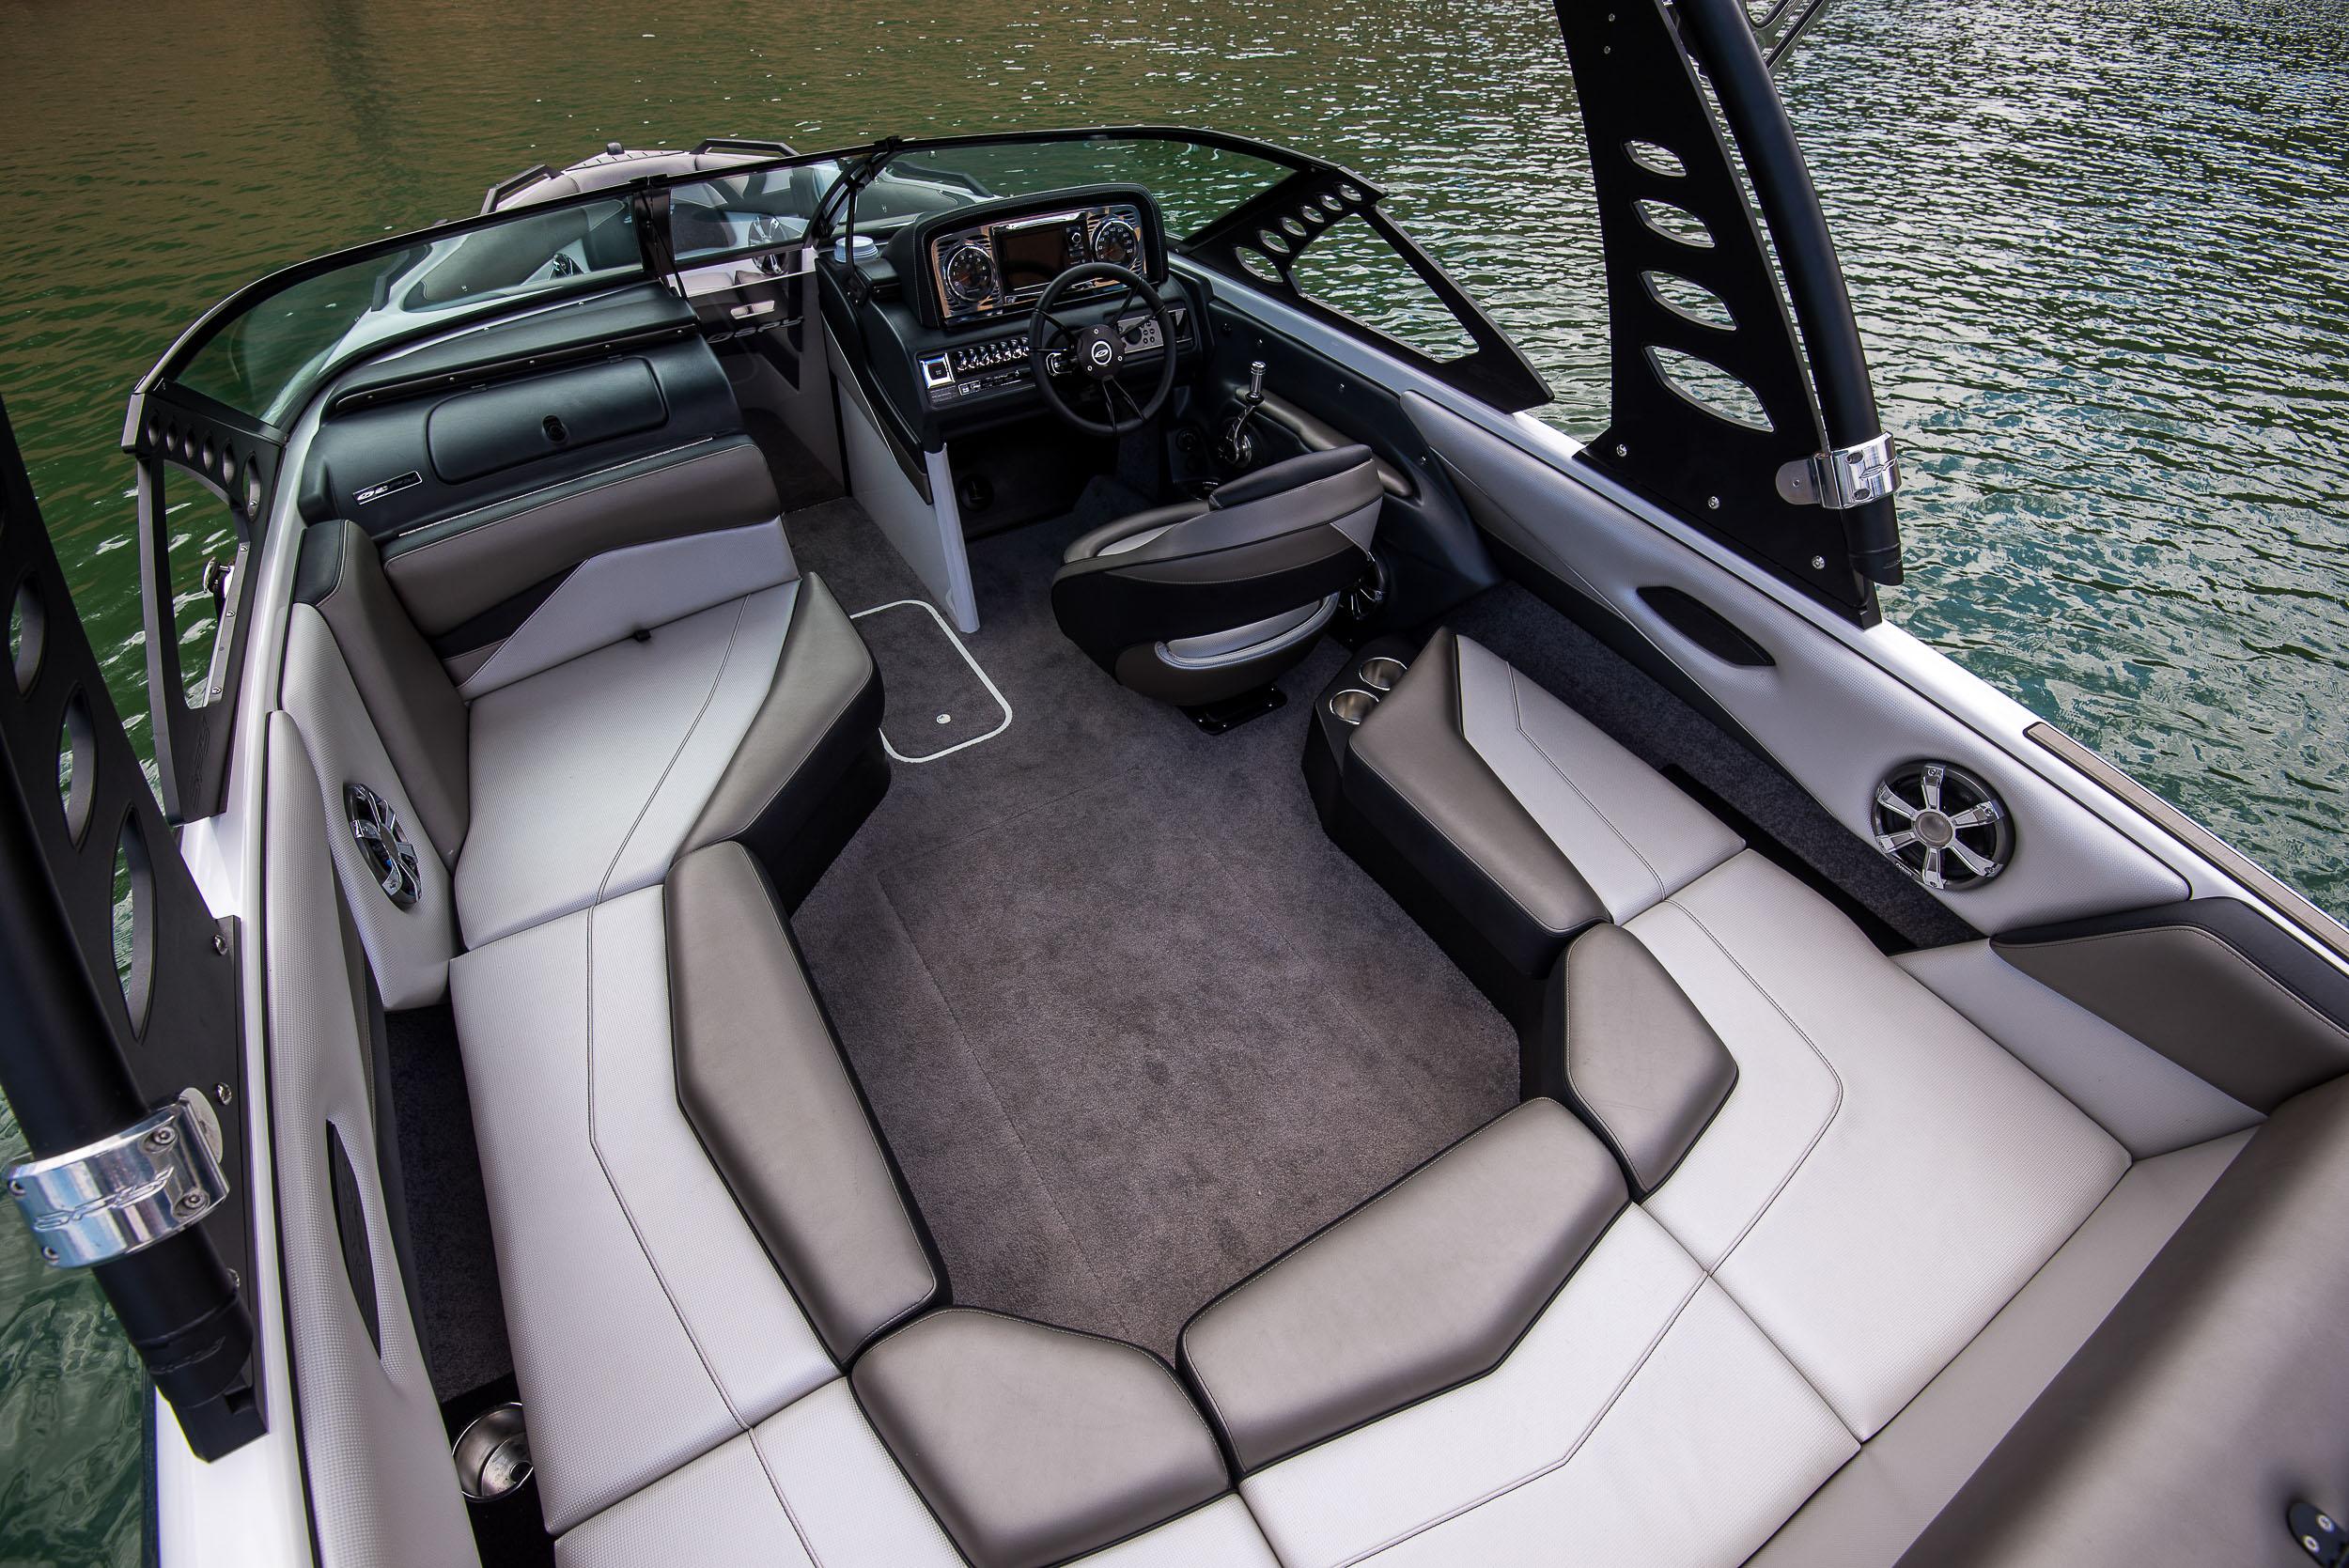 Spy_Boats_RX22-29.jpg